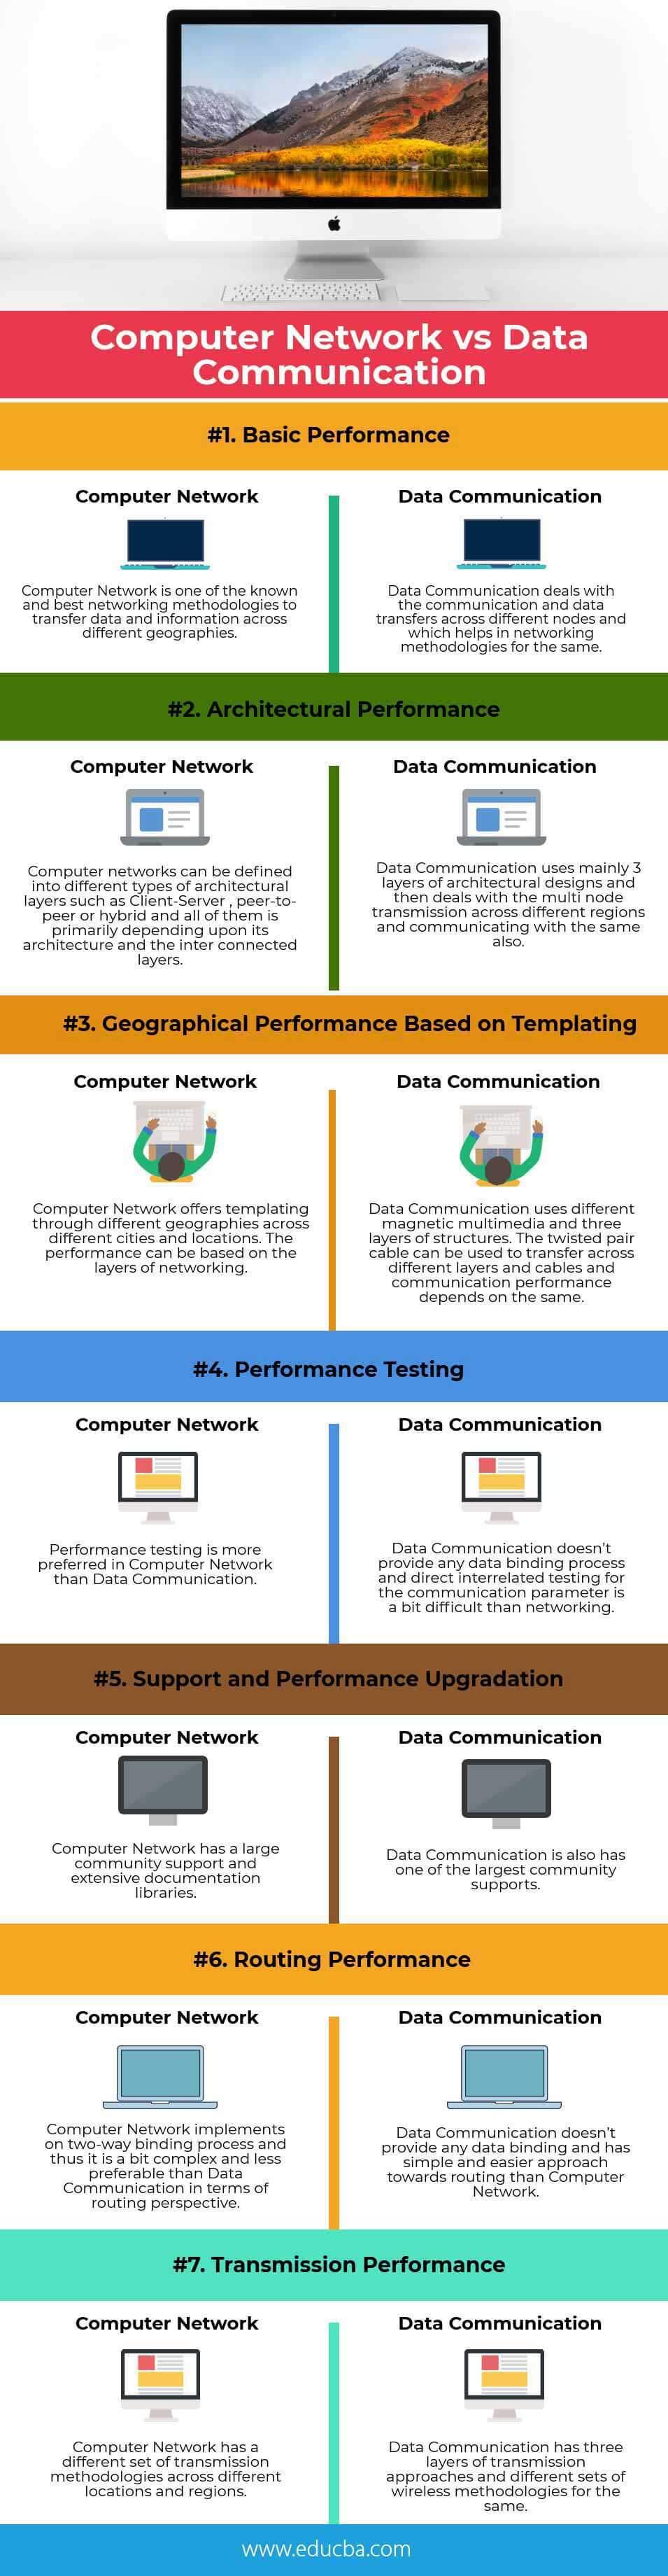 Computer Network vs Data Communication | 7 Best Valuable